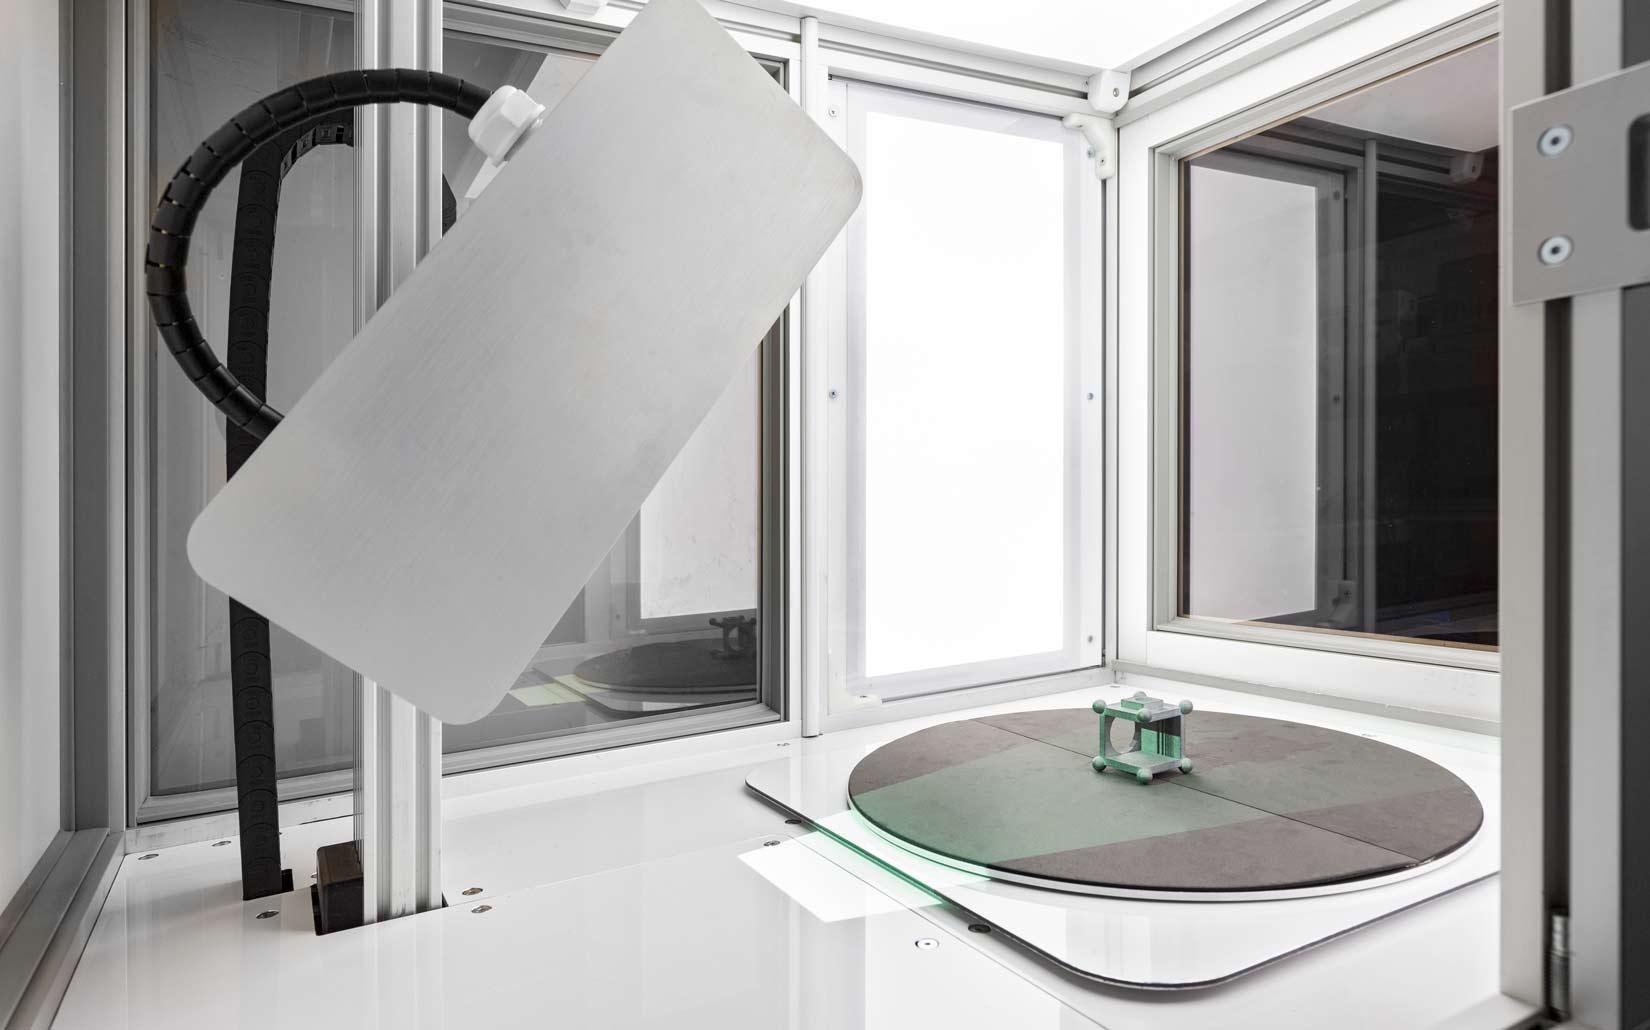 Industrial-Machine-Photography-object-scanning-by-industrial-phtoographer-Matthew-Jones